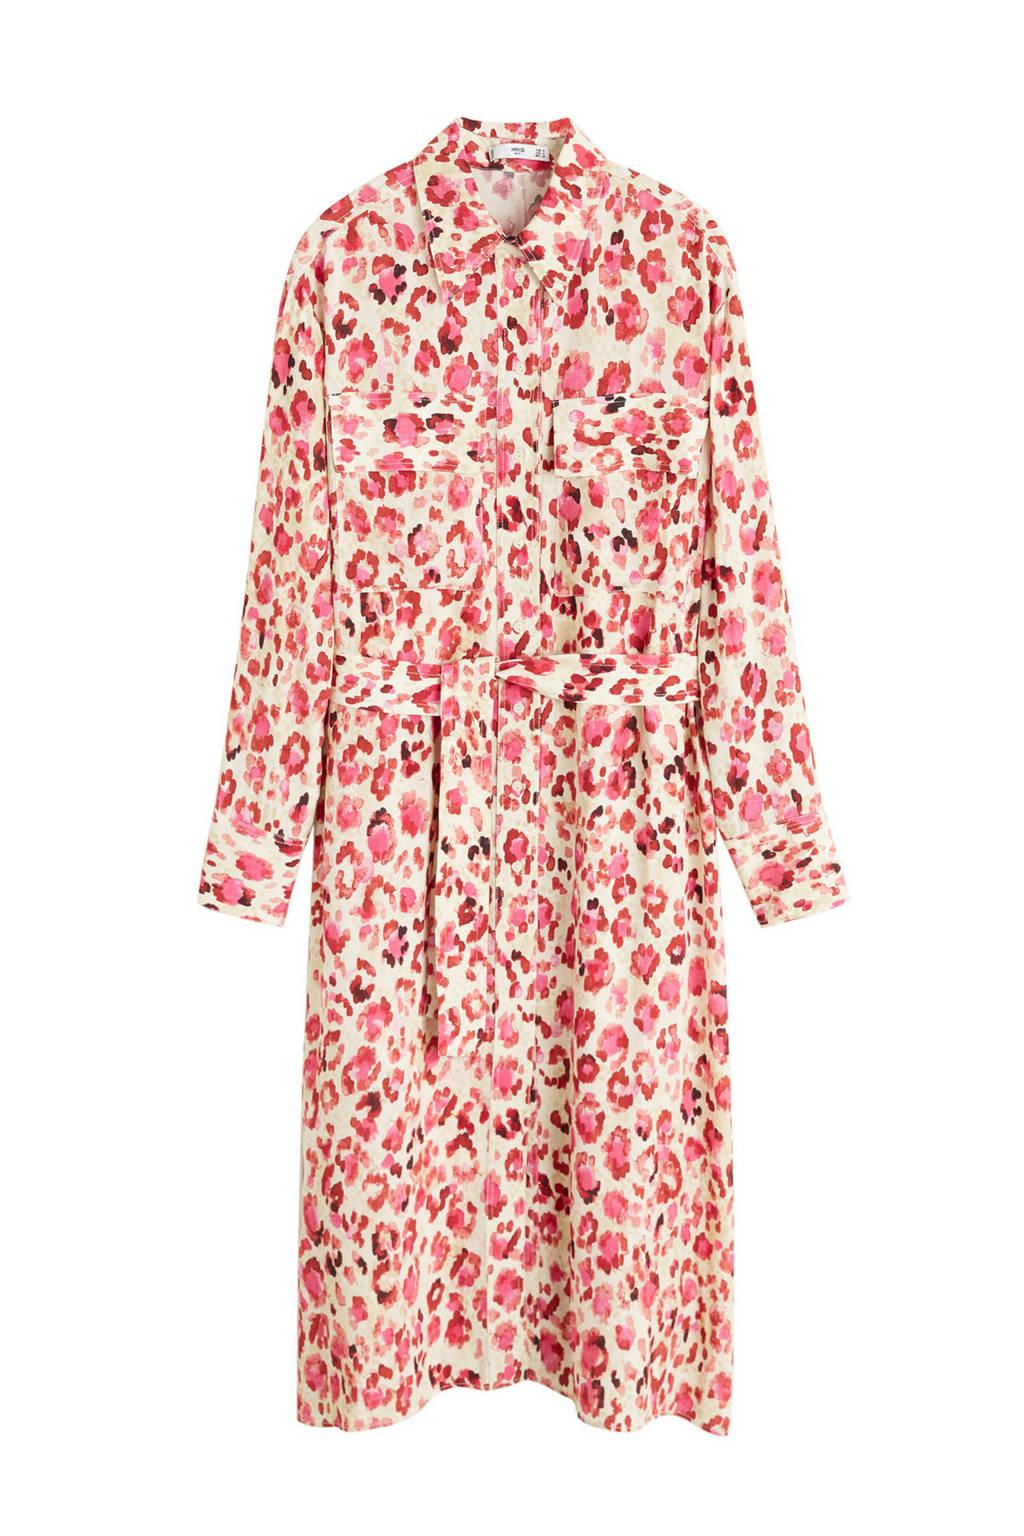 Mango jurk met panterprint, Rood/wit/roze